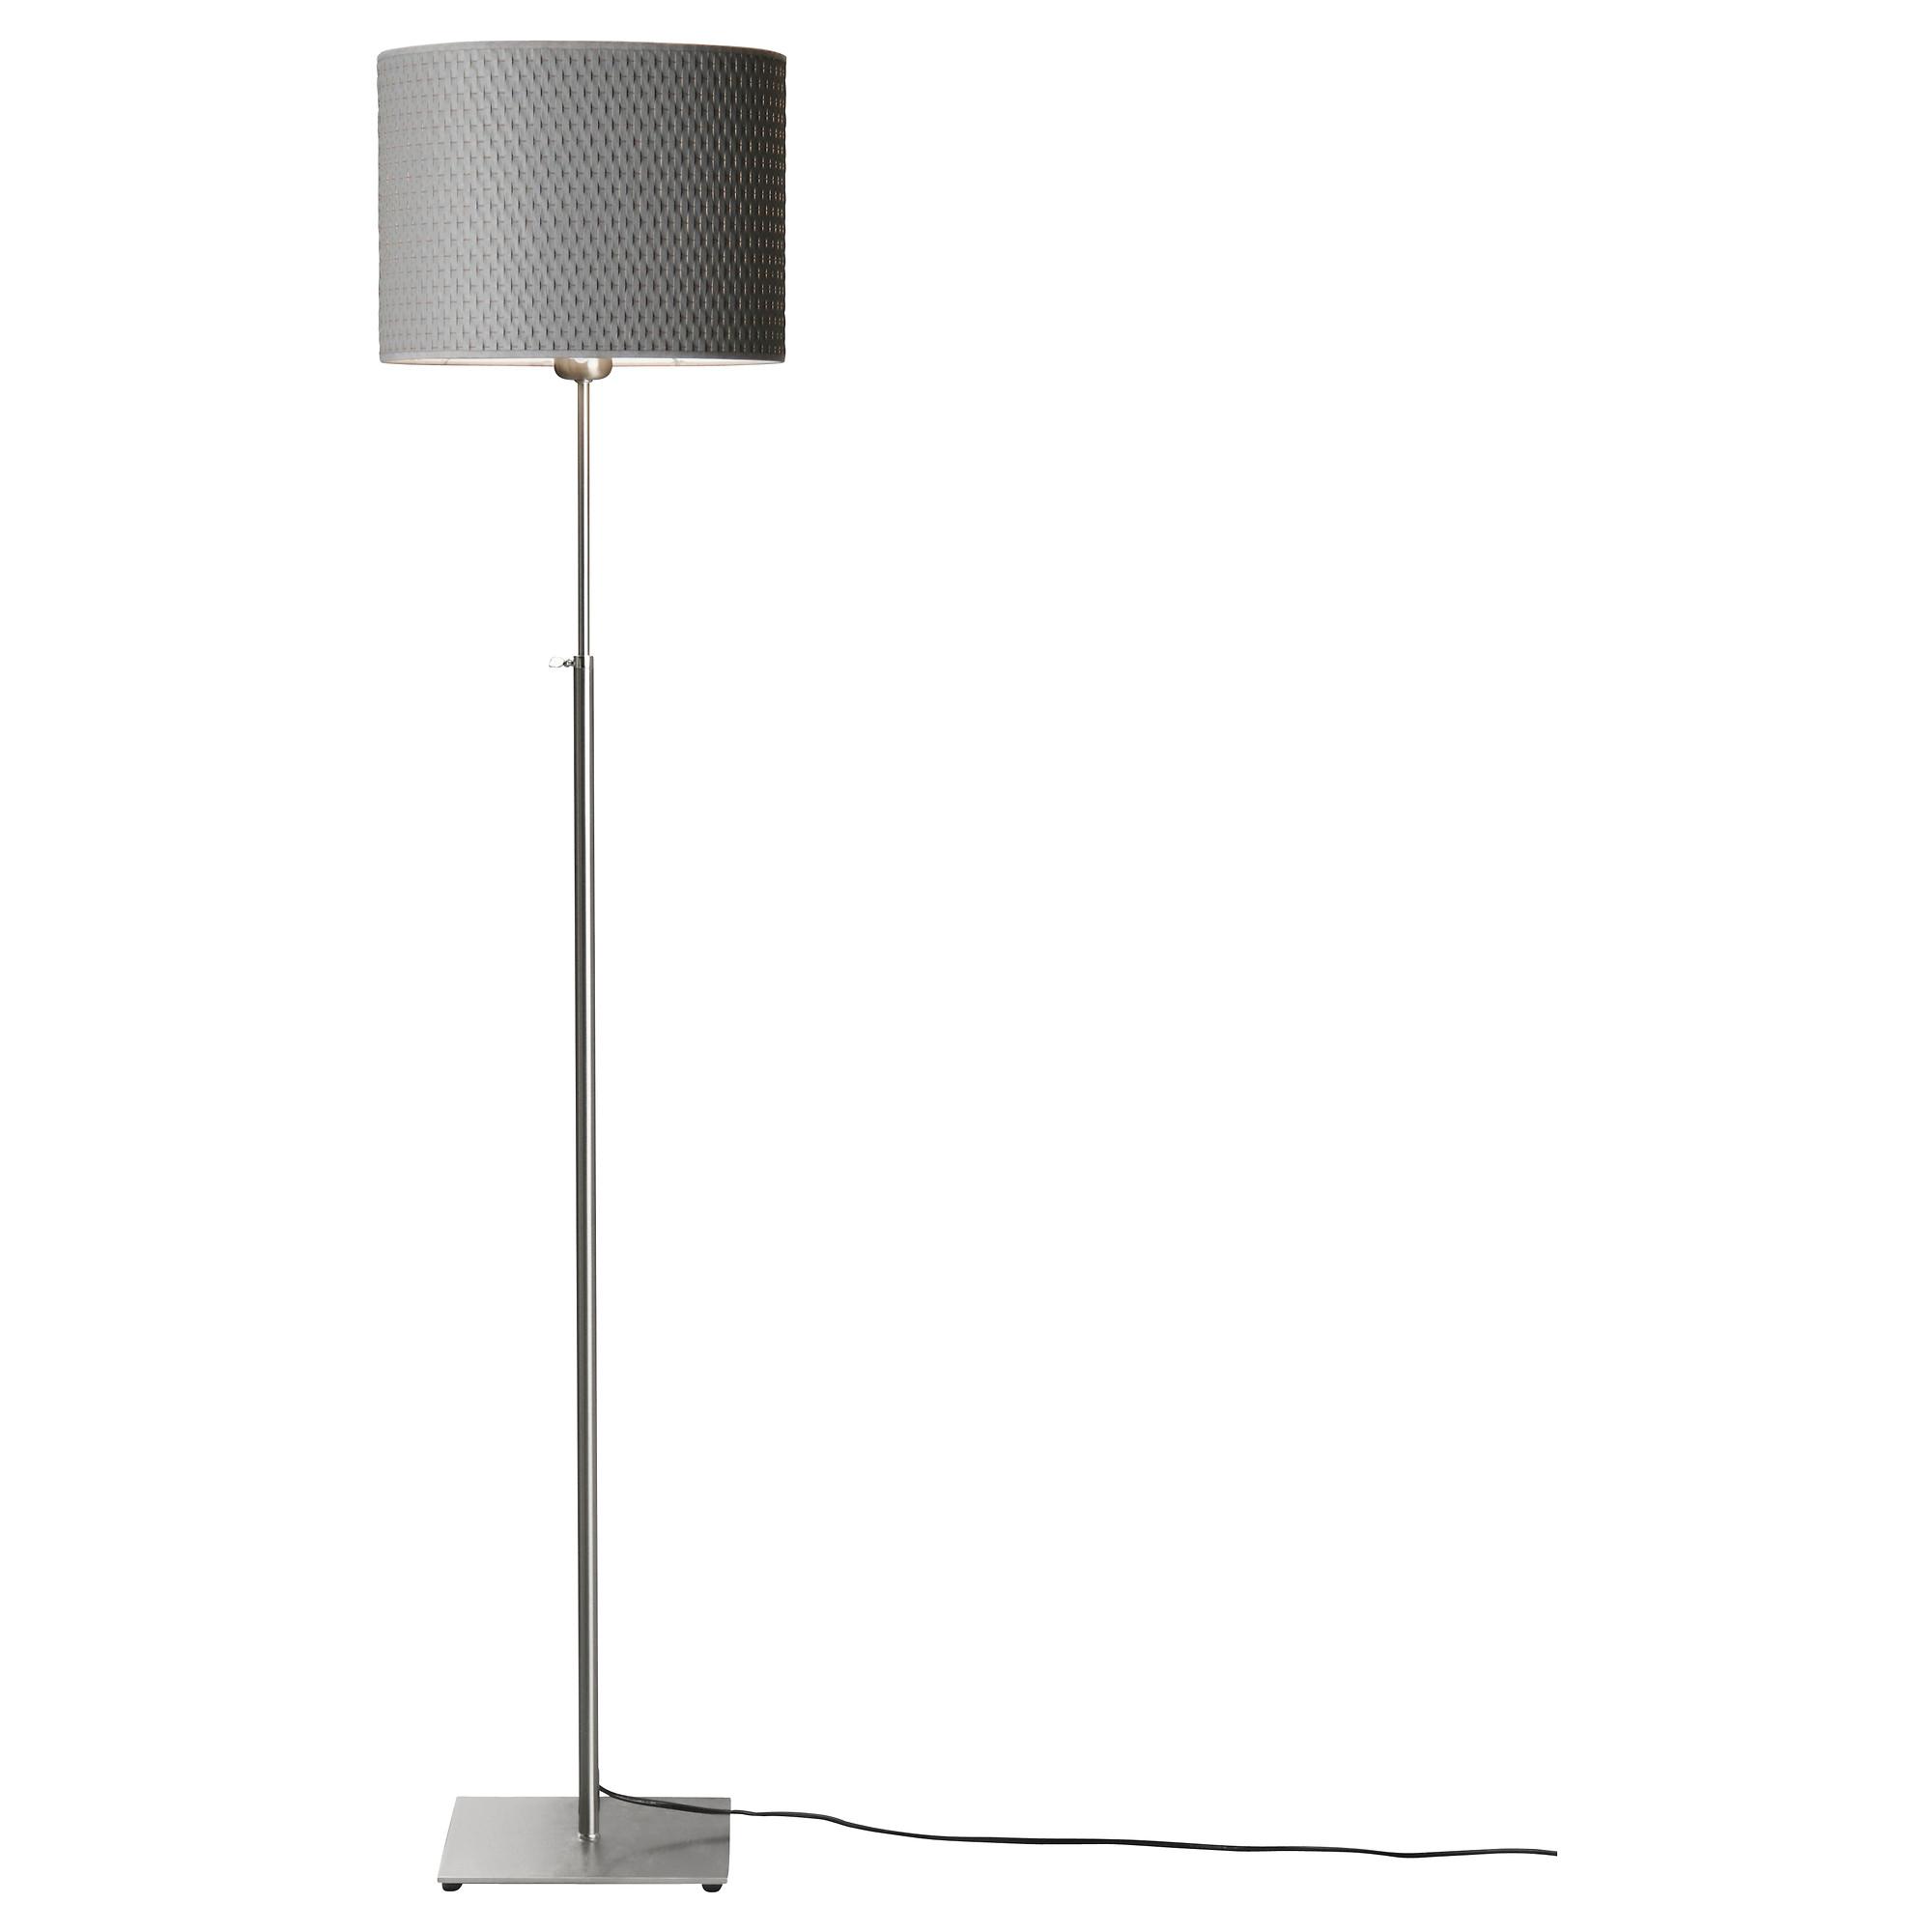 lampe lave ikea interesting beautiful toutes les marques. Black Bedroom Furniture Sets. Home Design Ideas